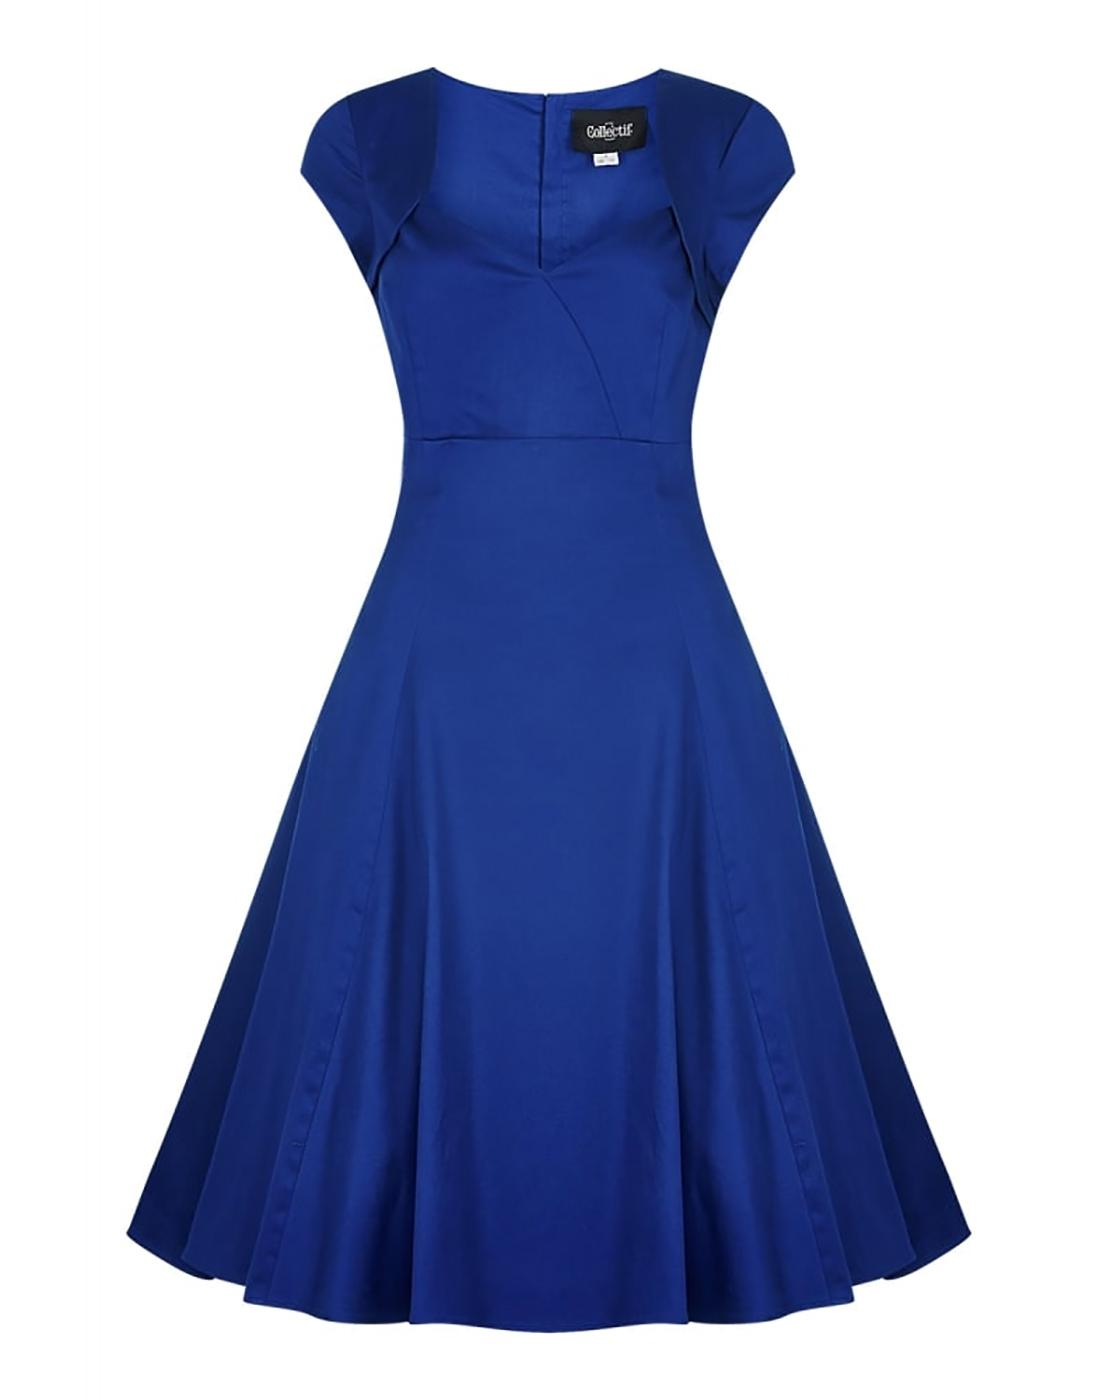 Regina COLLECTIF Retro 50s Vintage Doll Dress Blue